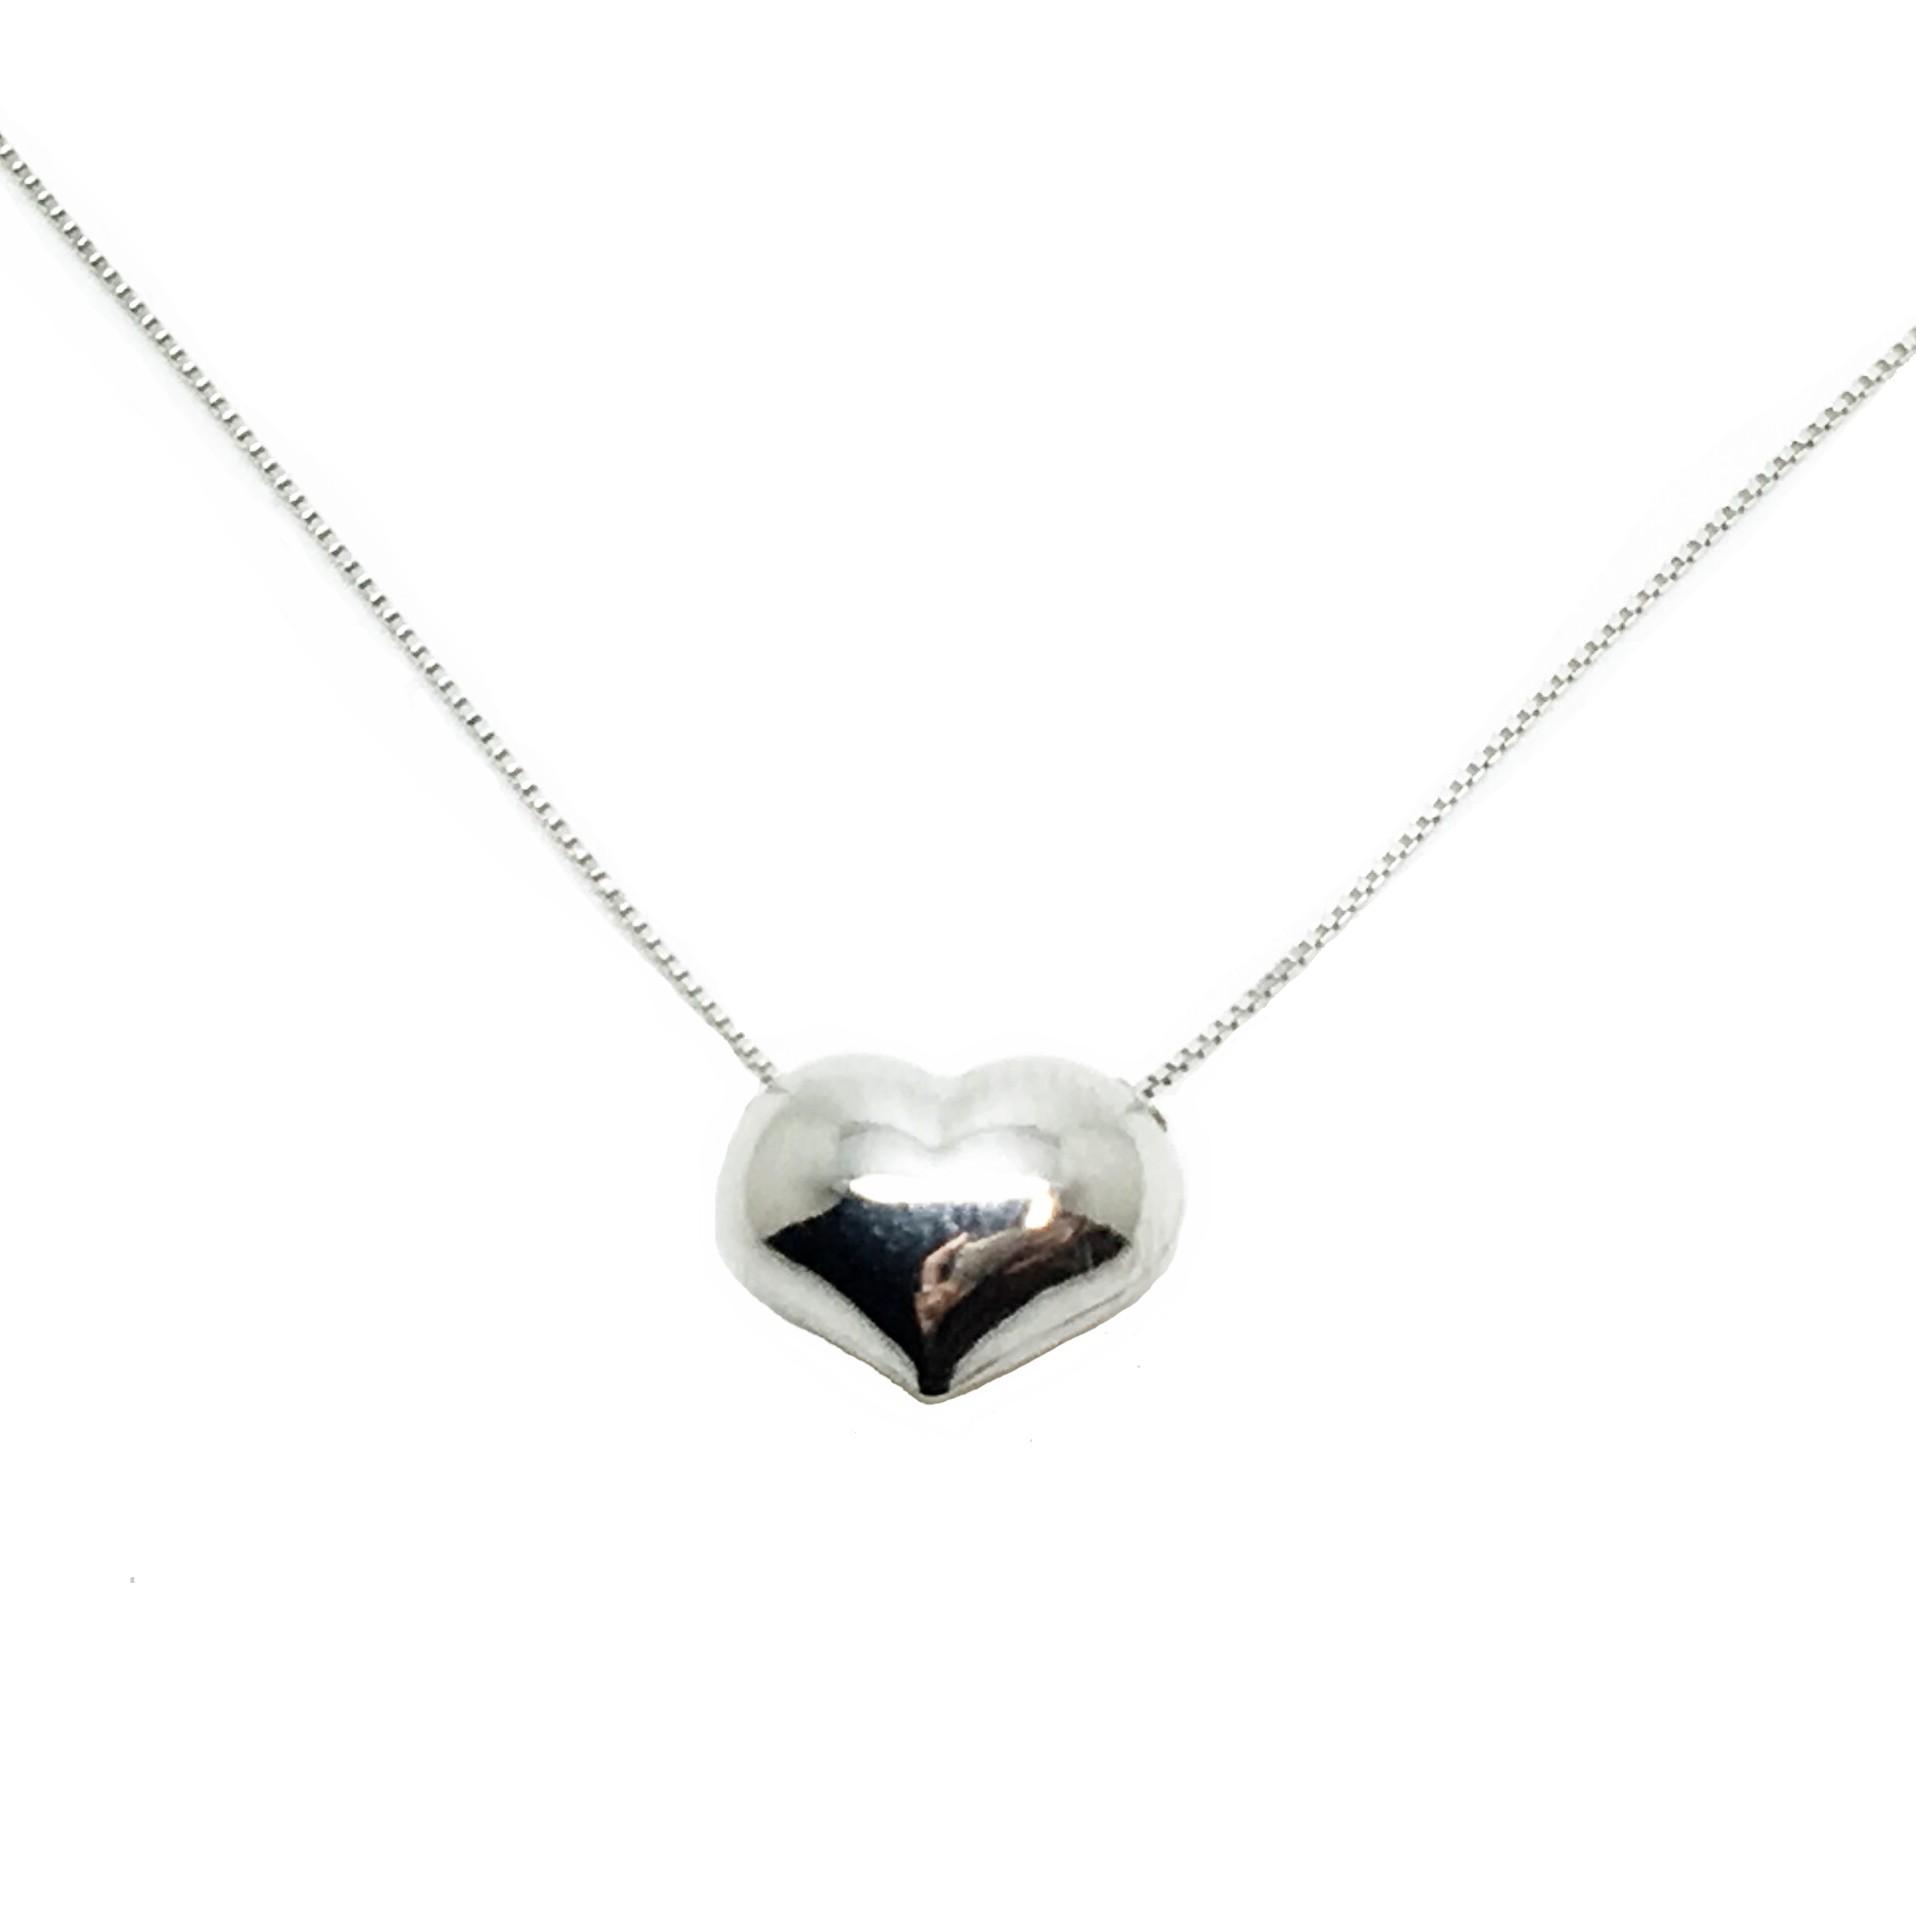 diseño de calidad 75a27 34e16 Gargantilla de oro blanco Corazón